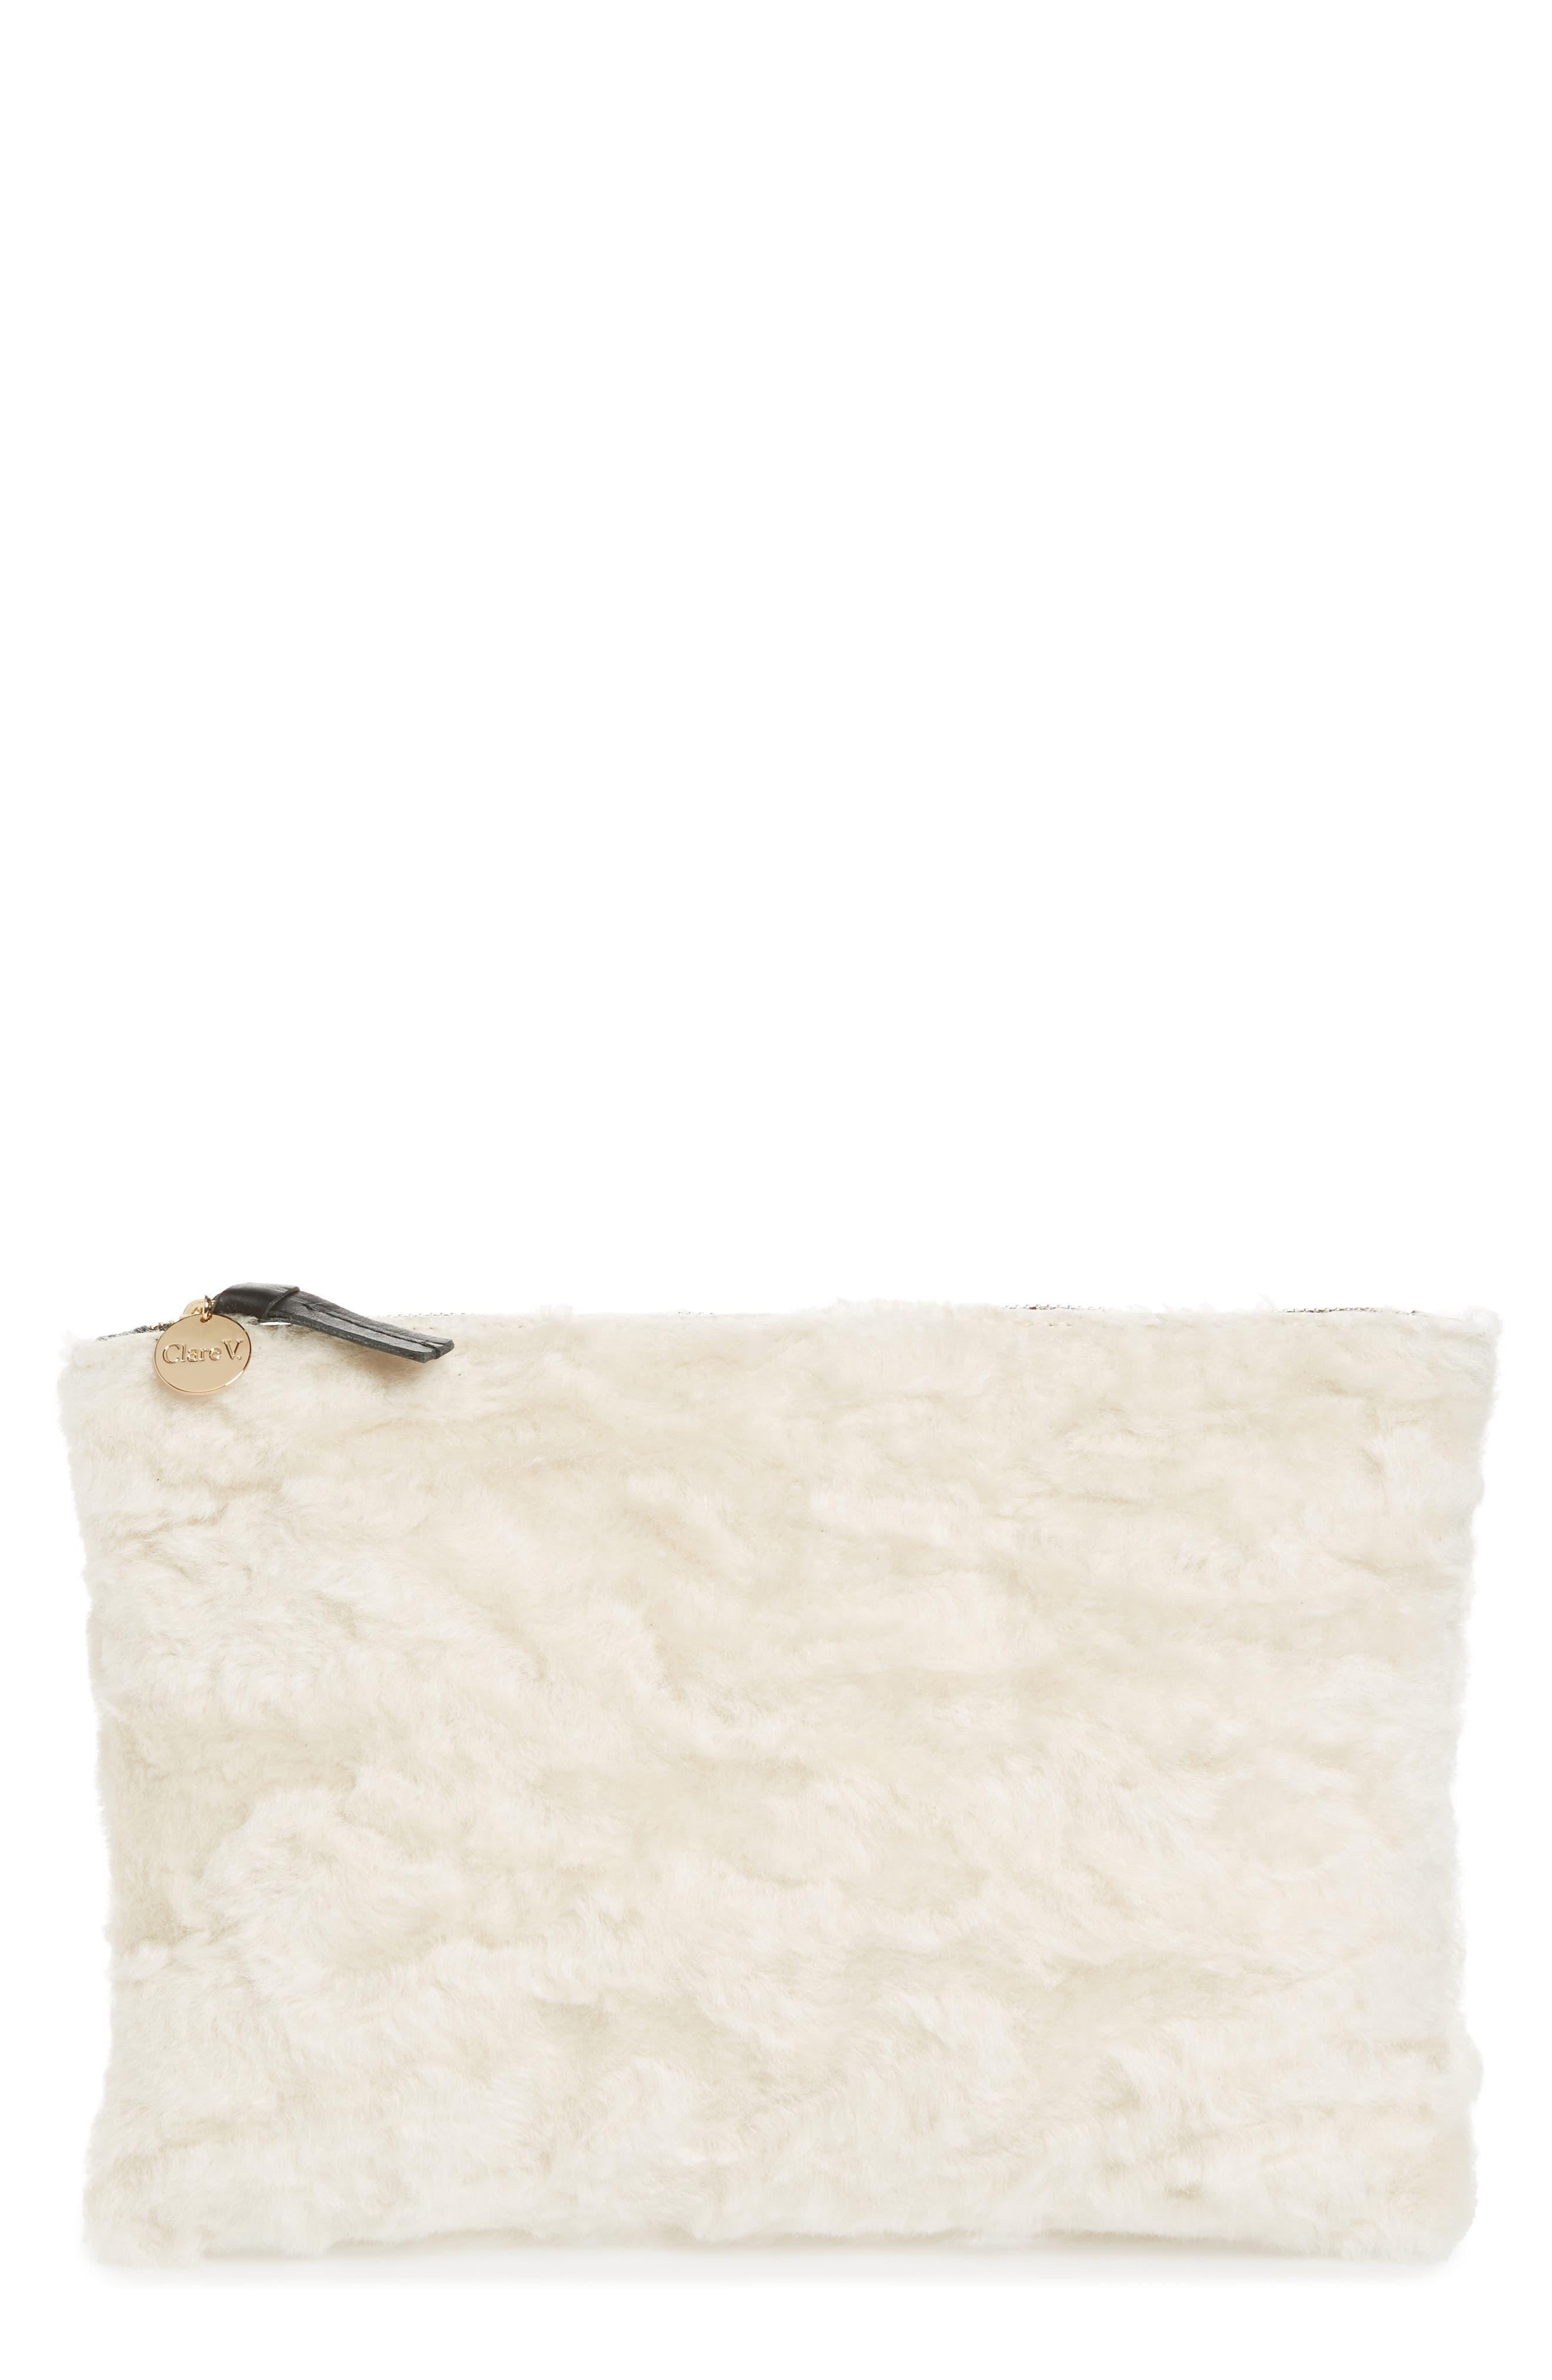 Genuine Shearling Flat Clutch,                             Main thumbnail 1, color,                             900